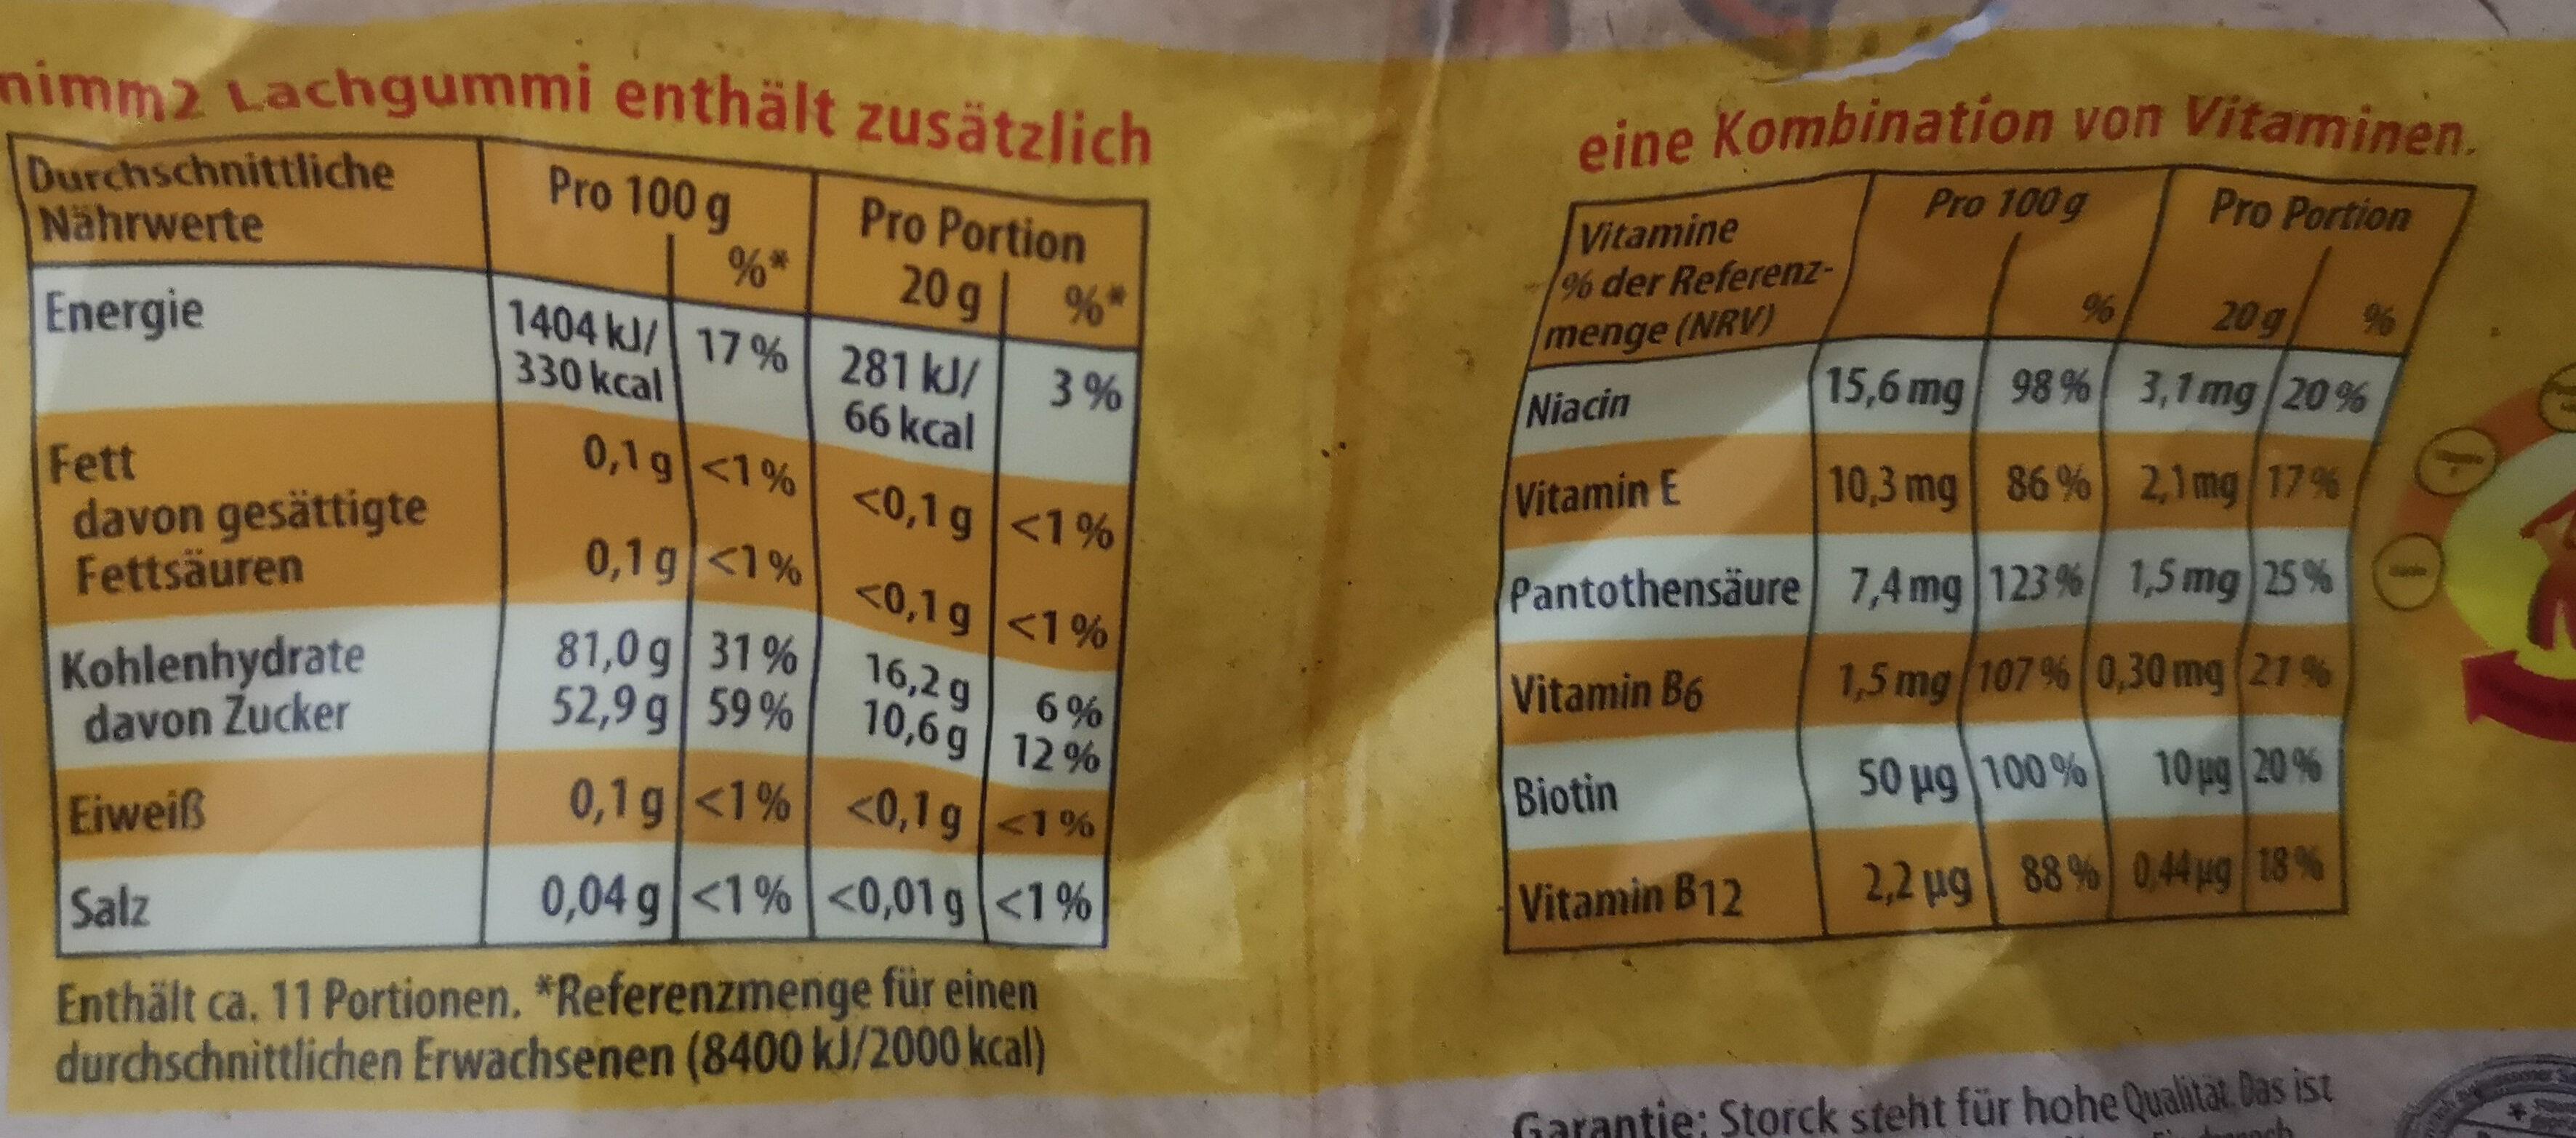 Lachgummi frutivity - Nutrition facts